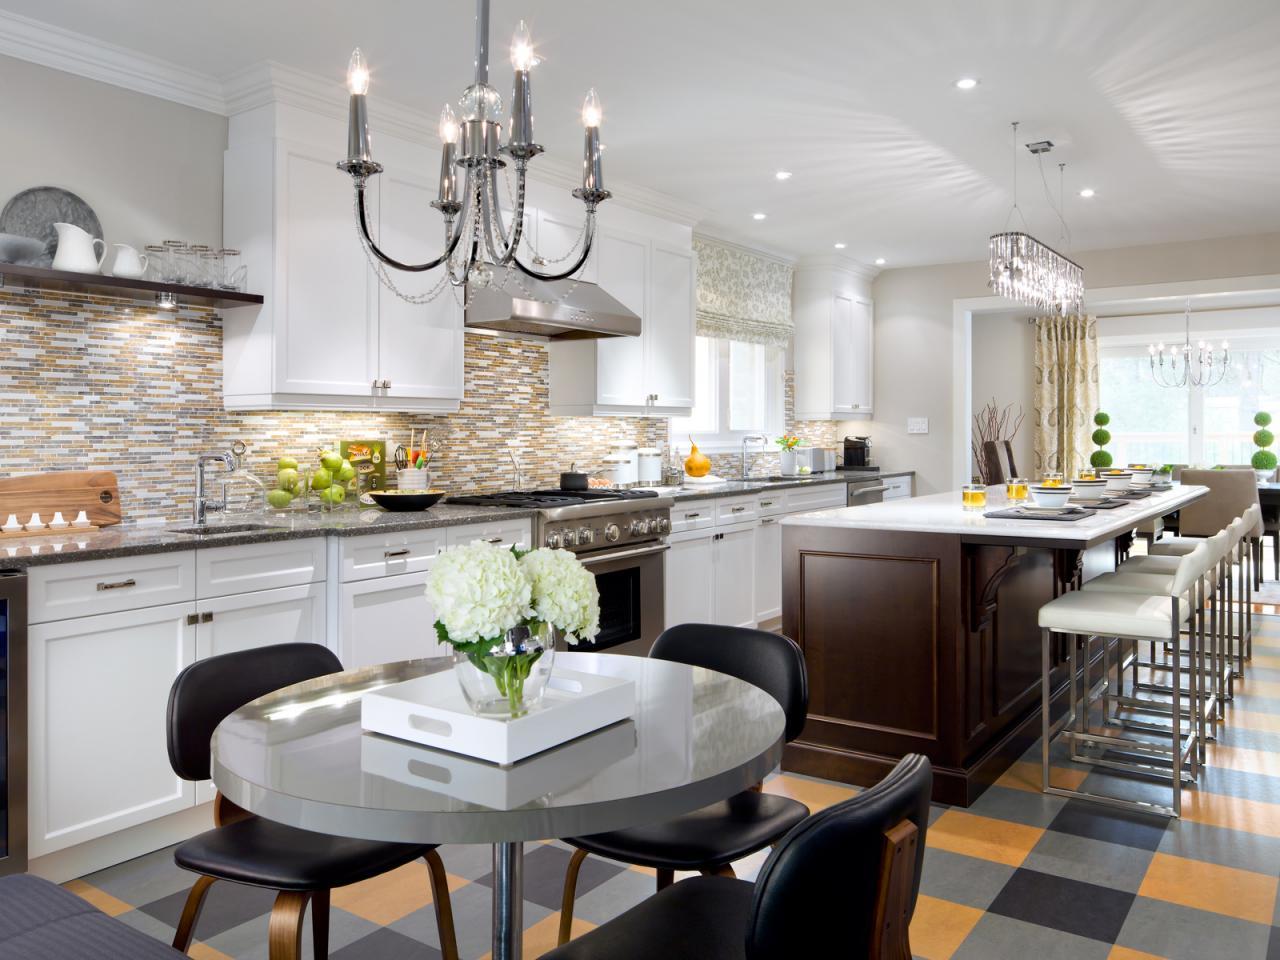 candice olson grey kitchen photo - 1